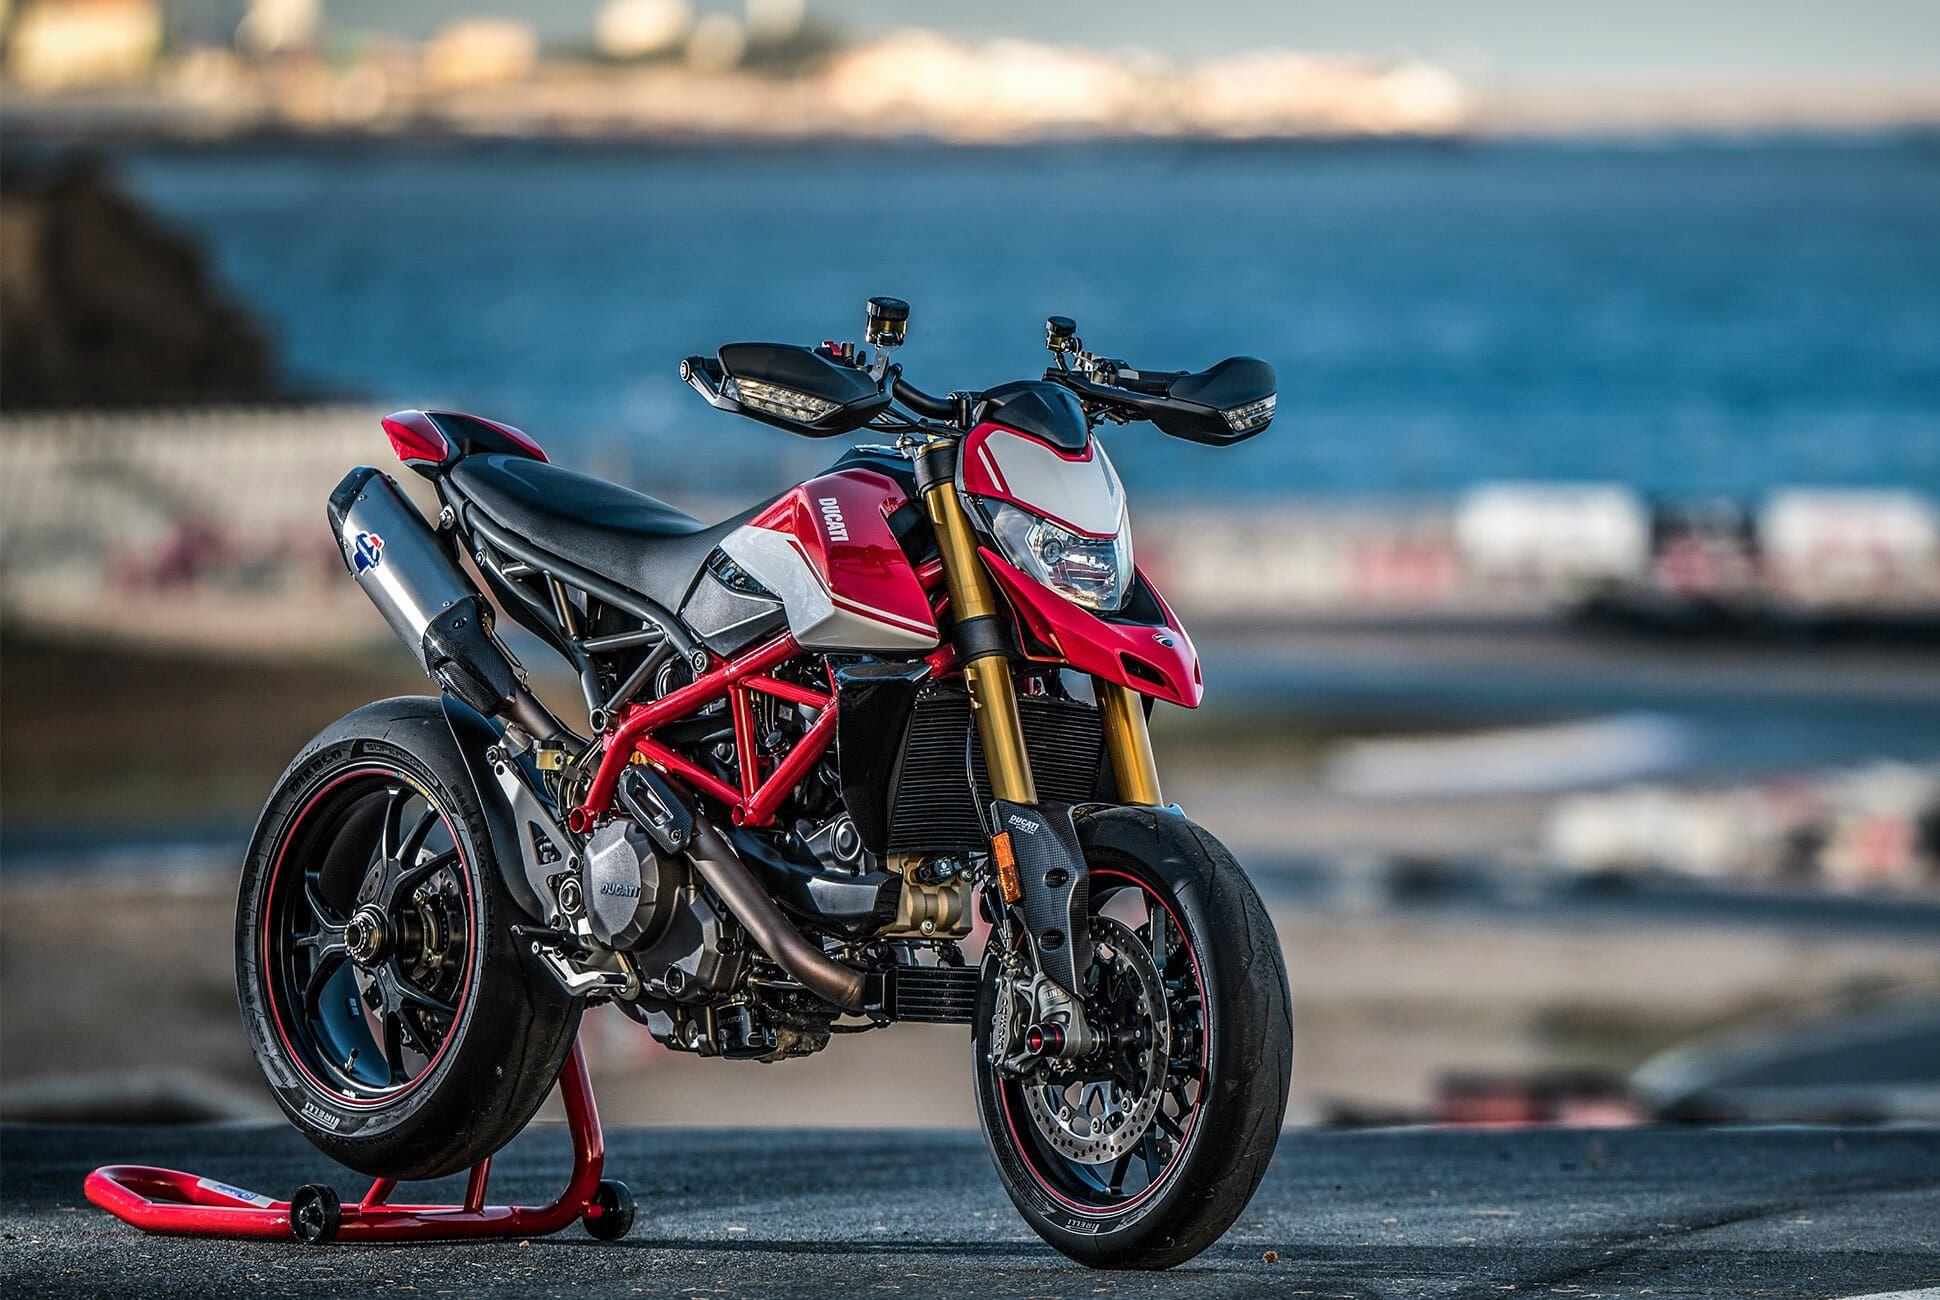 Ducati-Hypermotard-950-SP-Review-gear-patrol-slide-1